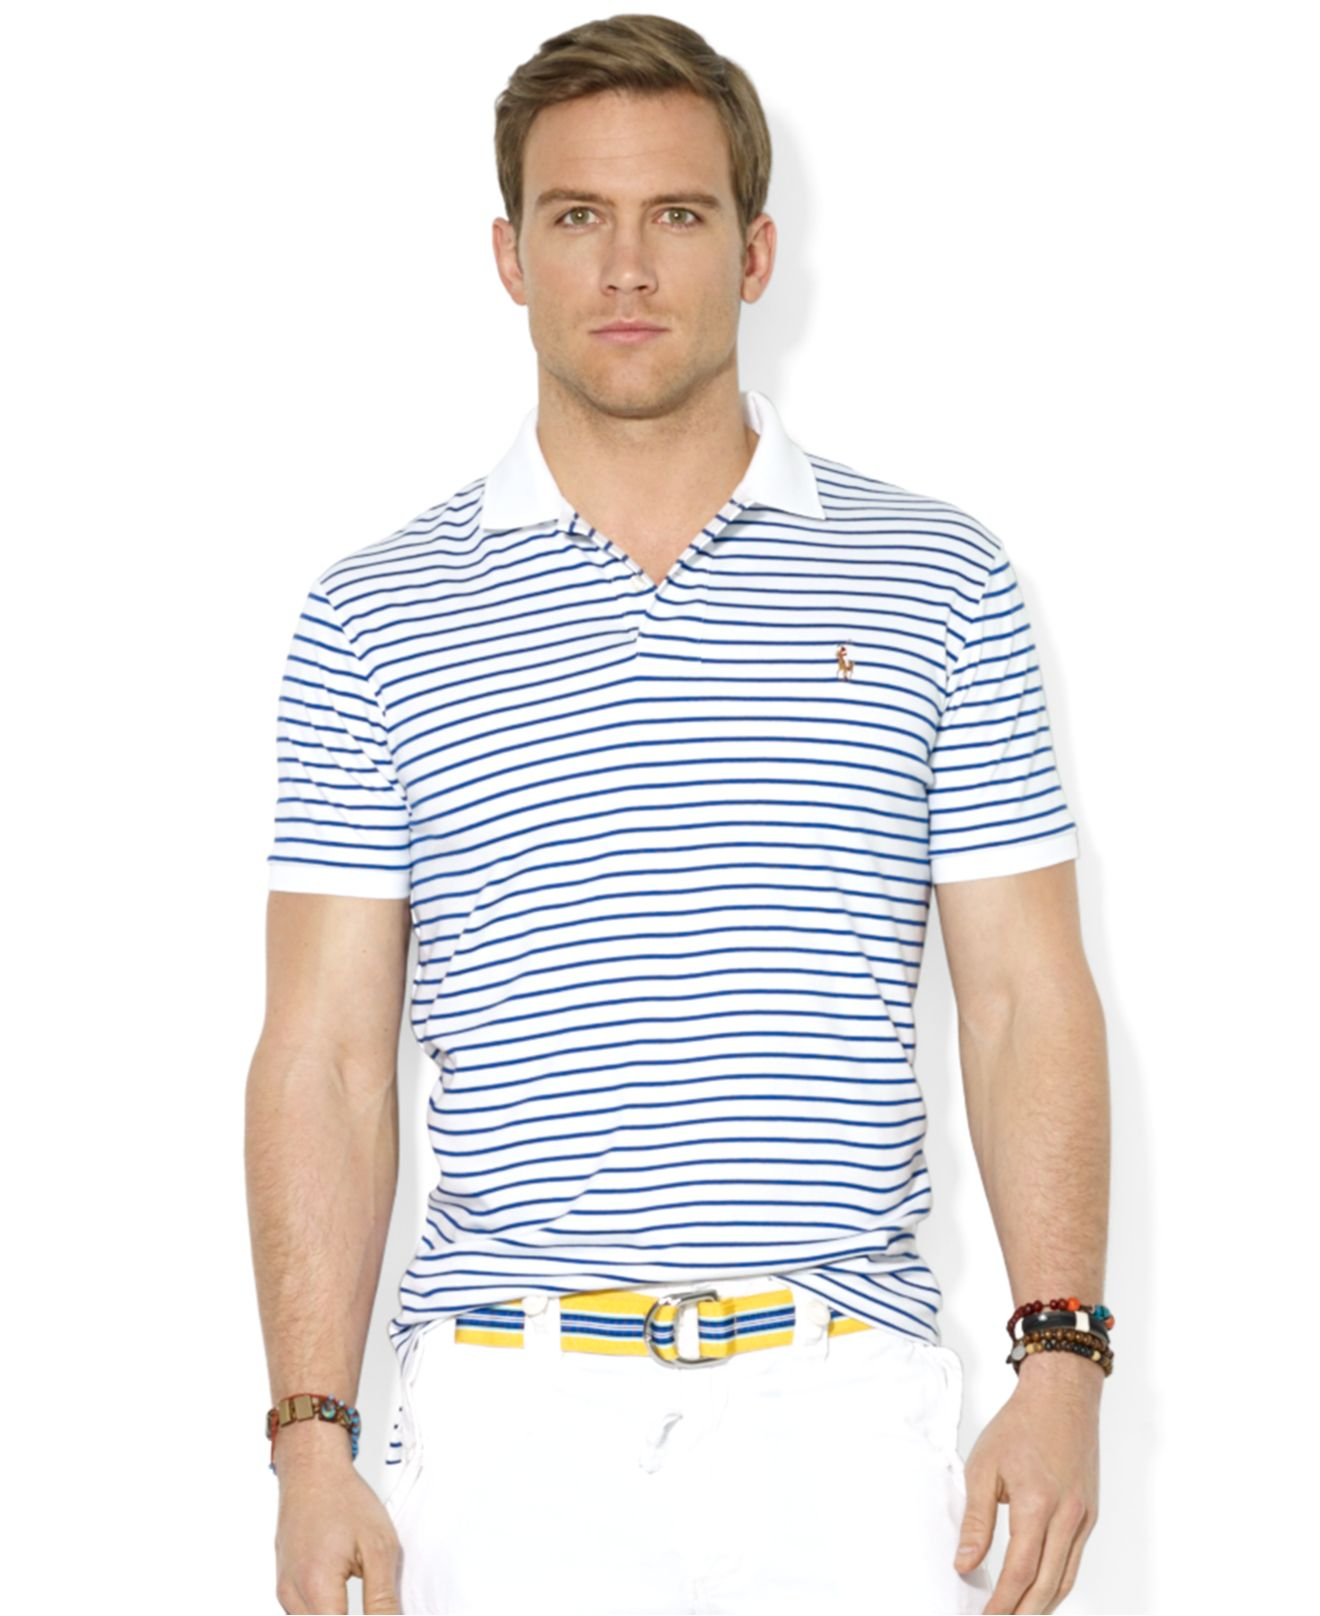 9baab3309c0 Lyst - Polo Ralph Lauren Polo Striped Pima Softtouch Polo Shirt in ...